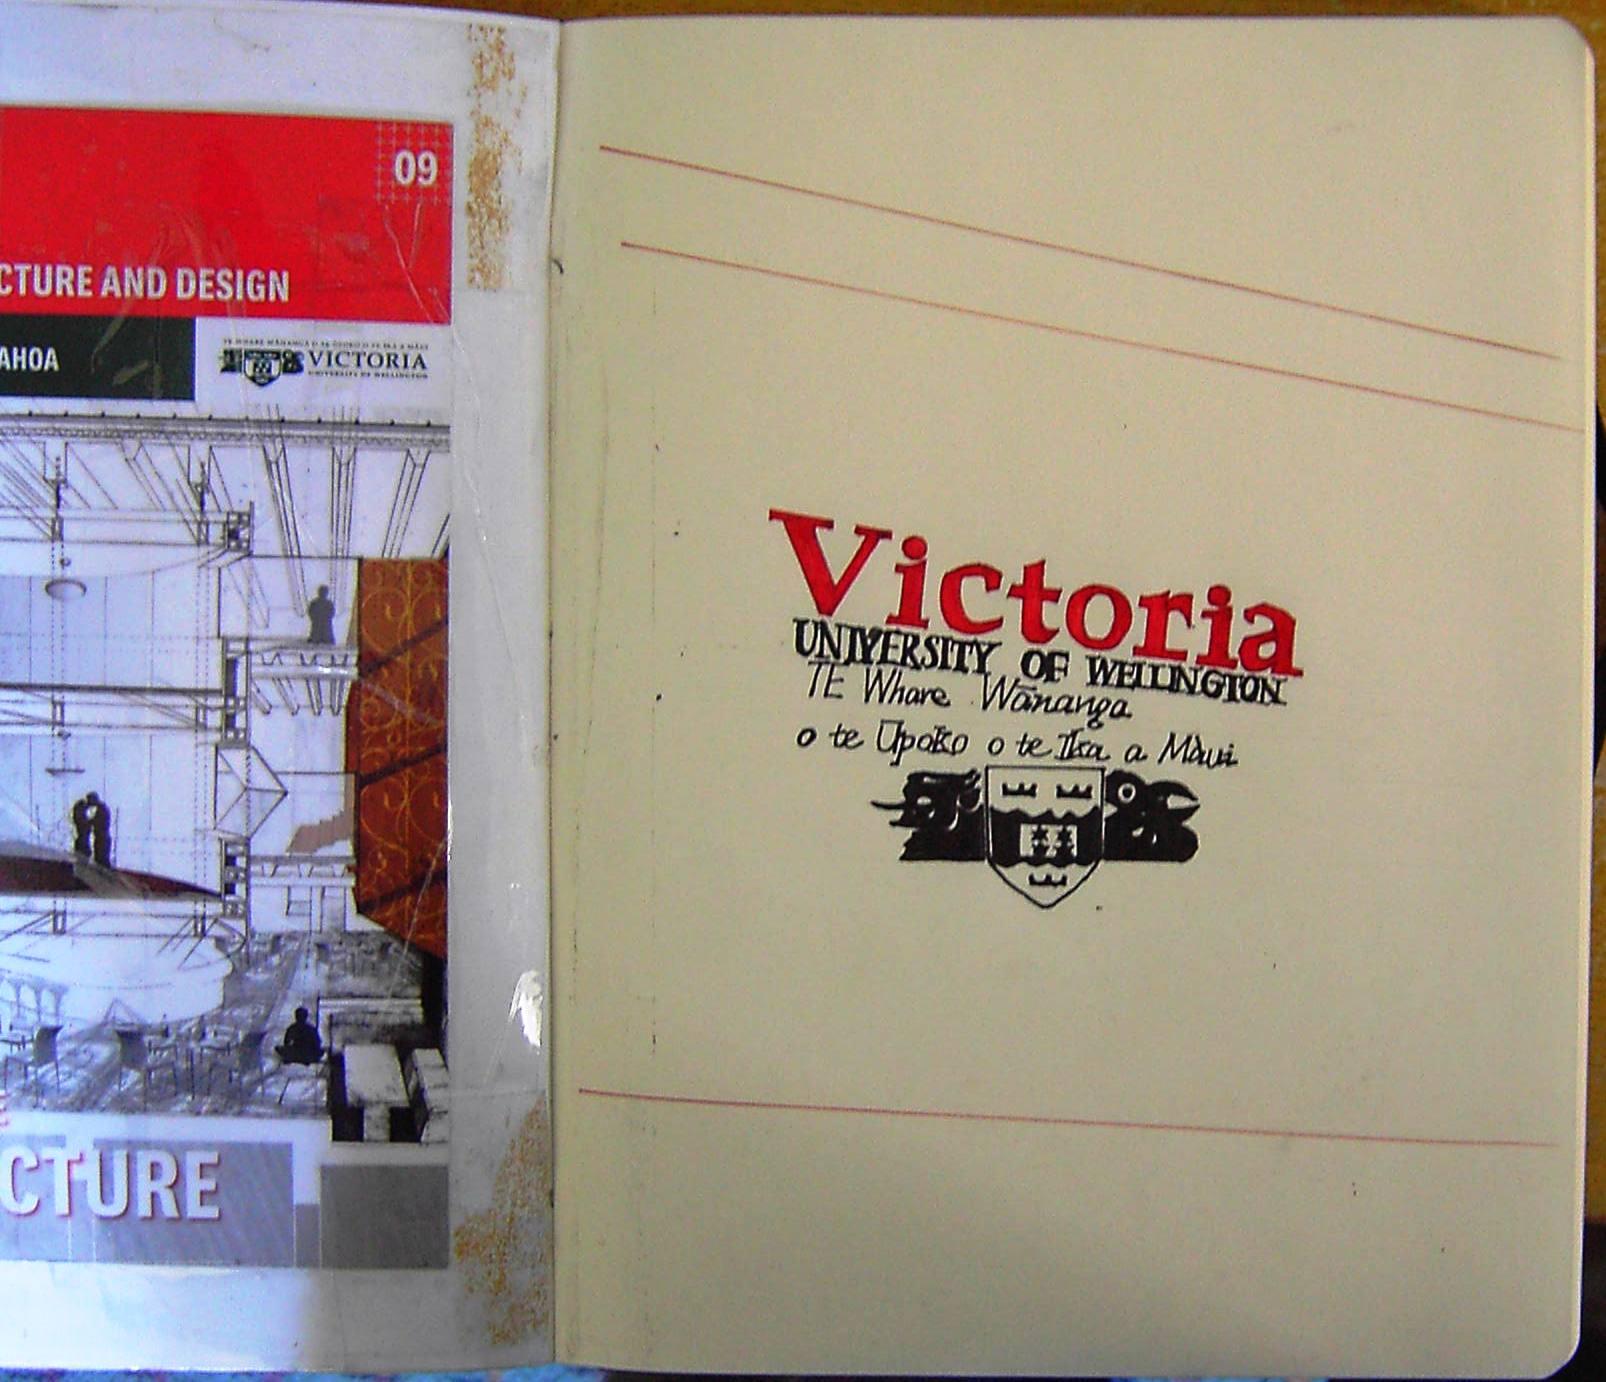 My drawing of Vicotira University Sign